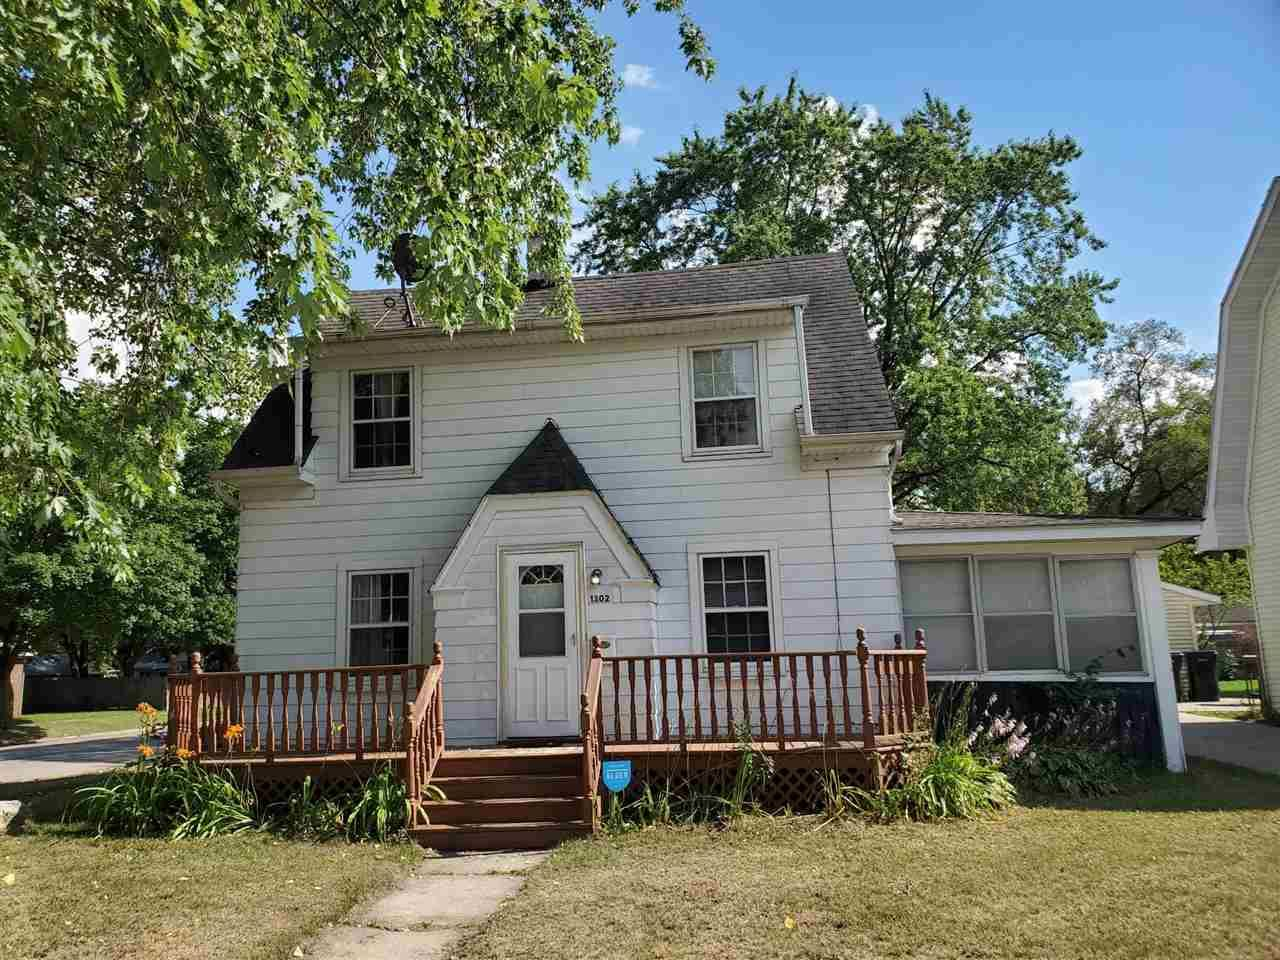 1302 St Lawrence Ave, Beloit, WI 53511 - #: 1889295